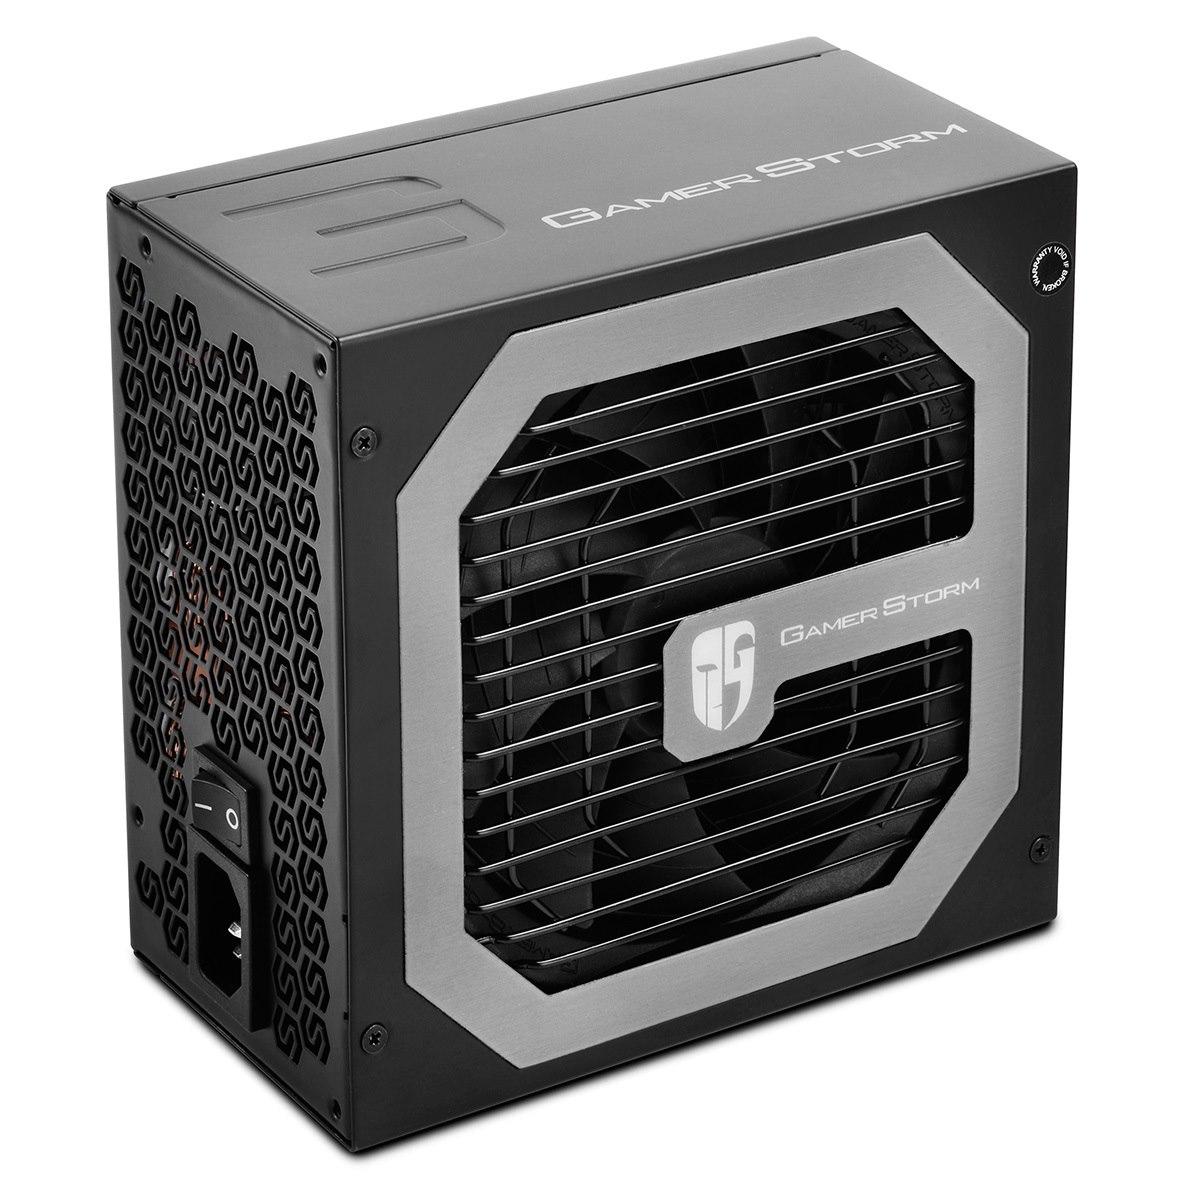 8Ware Deepcool GamerStorm DQ850-M 80+ Gold Certified 100% 850W Modular Psu